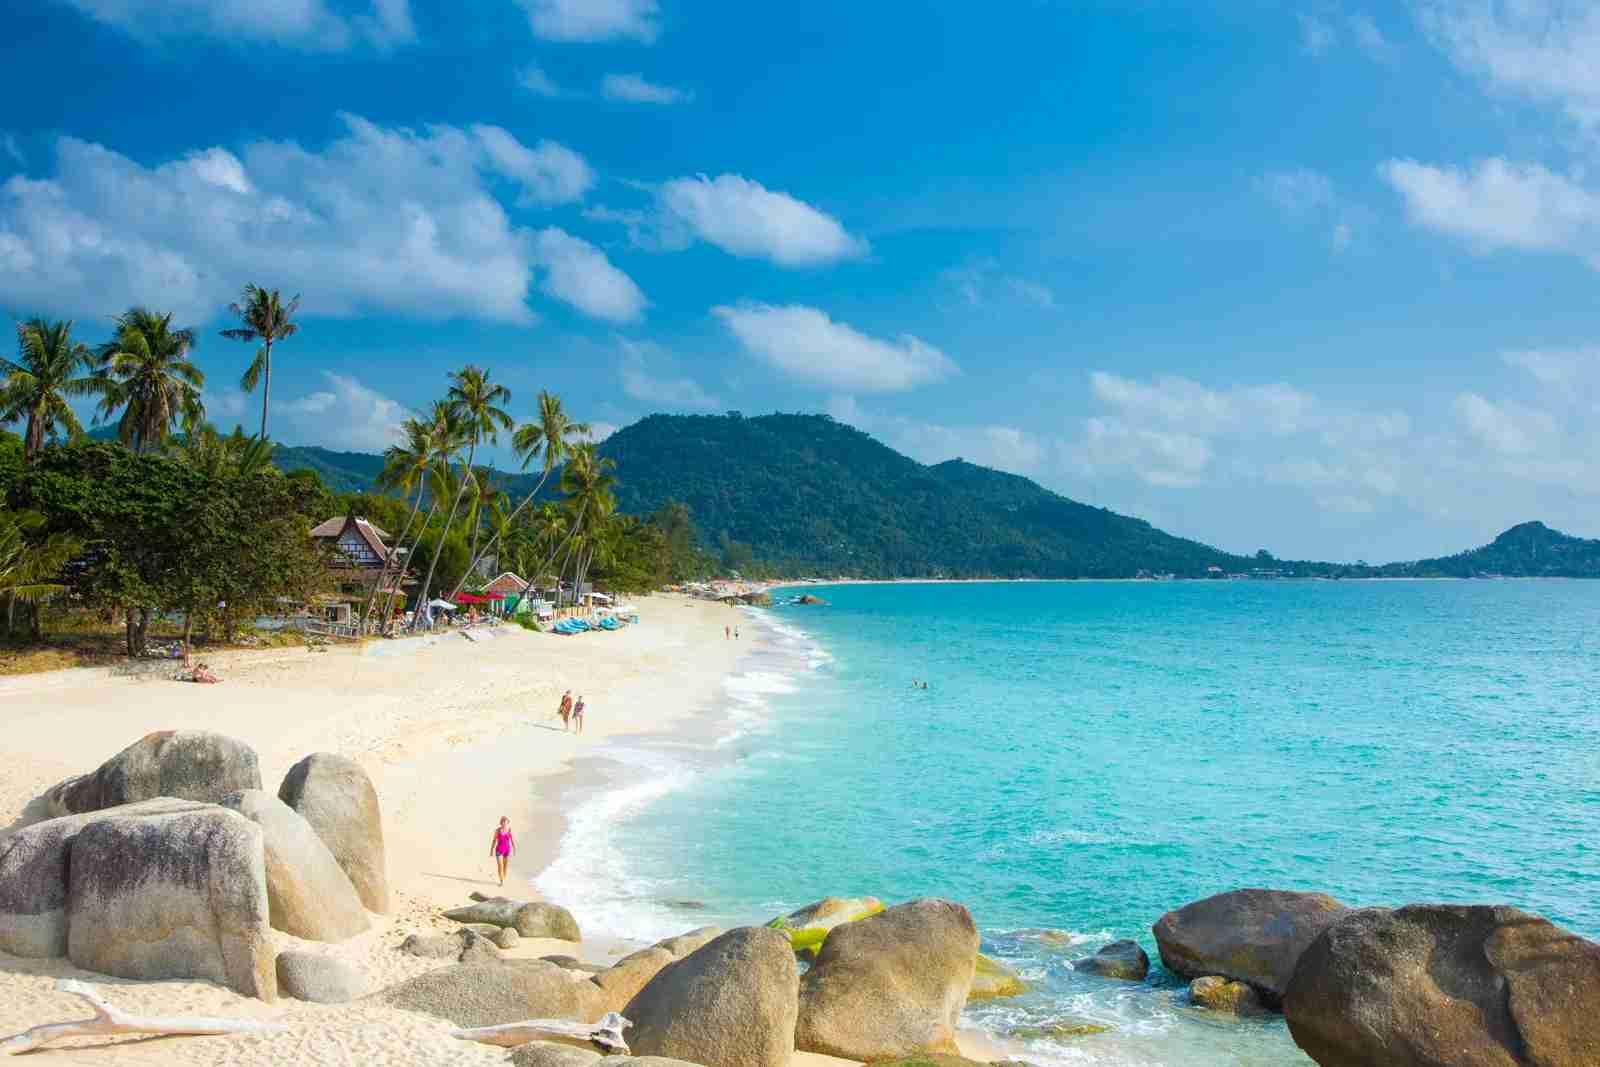 Lamai Beach in Koh Samui, Thailand. (Photo by Jon Arnold/Getty Images)